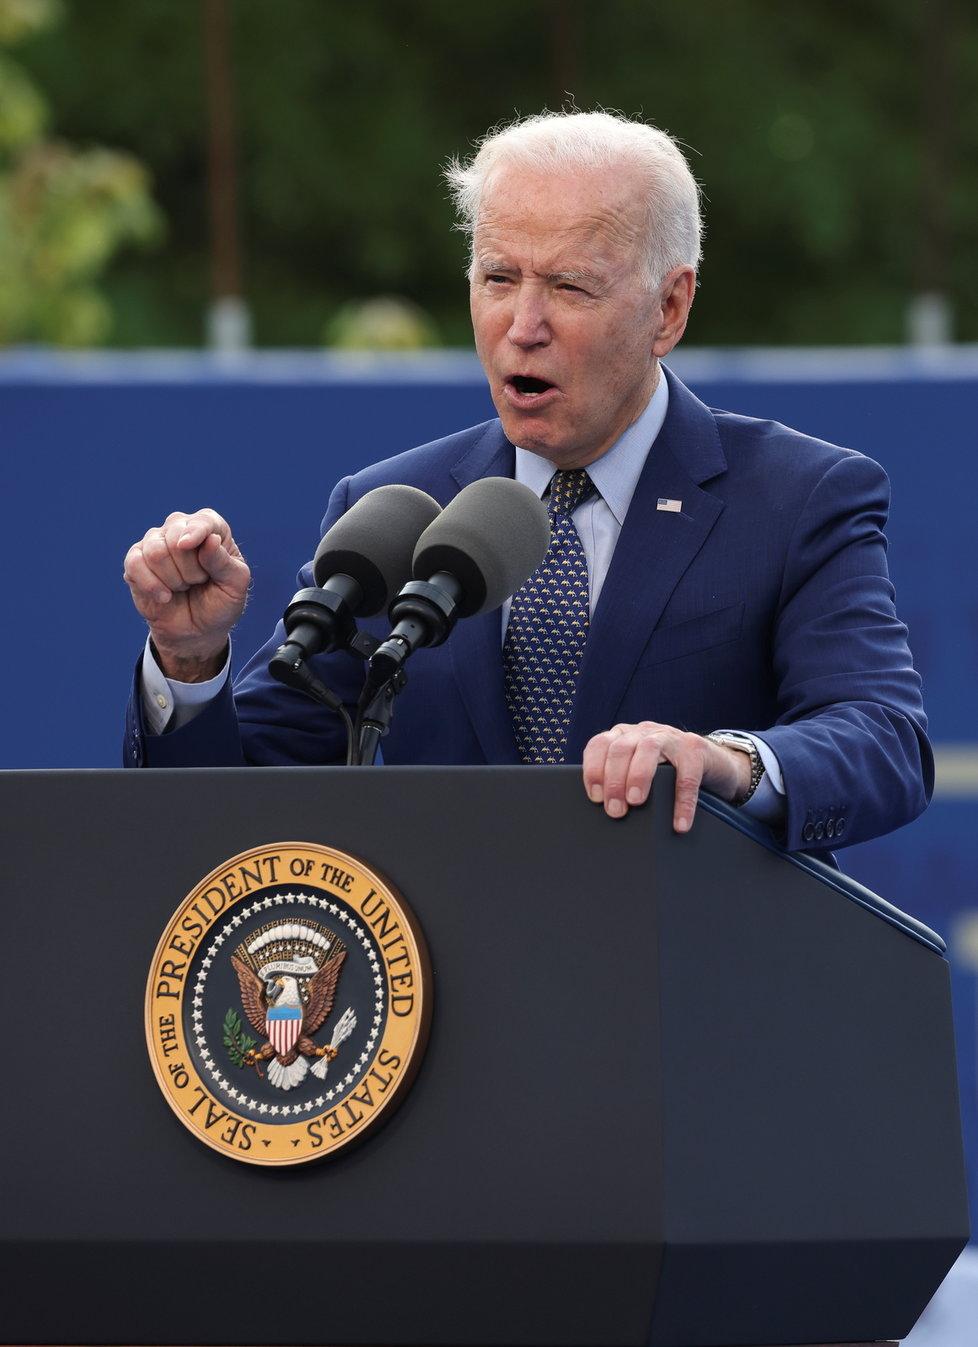 Prezident USA Joe Biden s manželkou Jill.